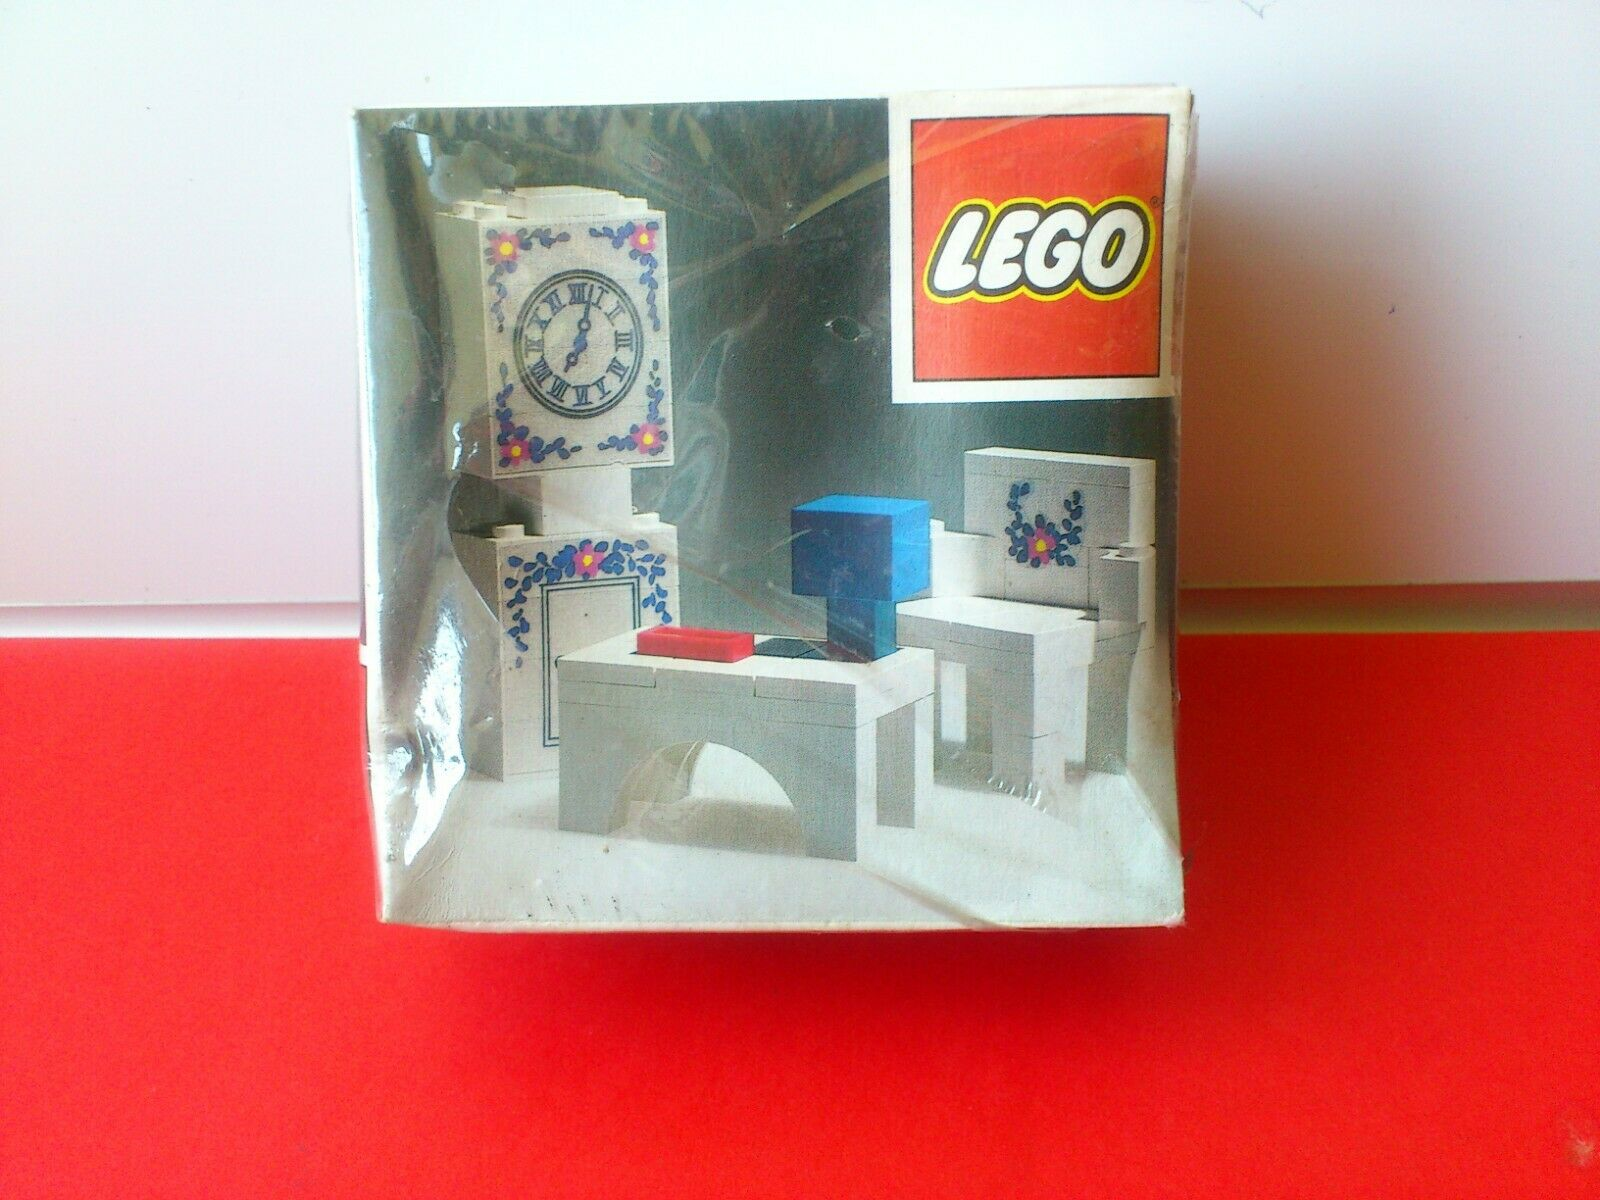 Jahr Lego set No.270 .Clock.Meerled in original shrink wrap. From 1972. Rare.